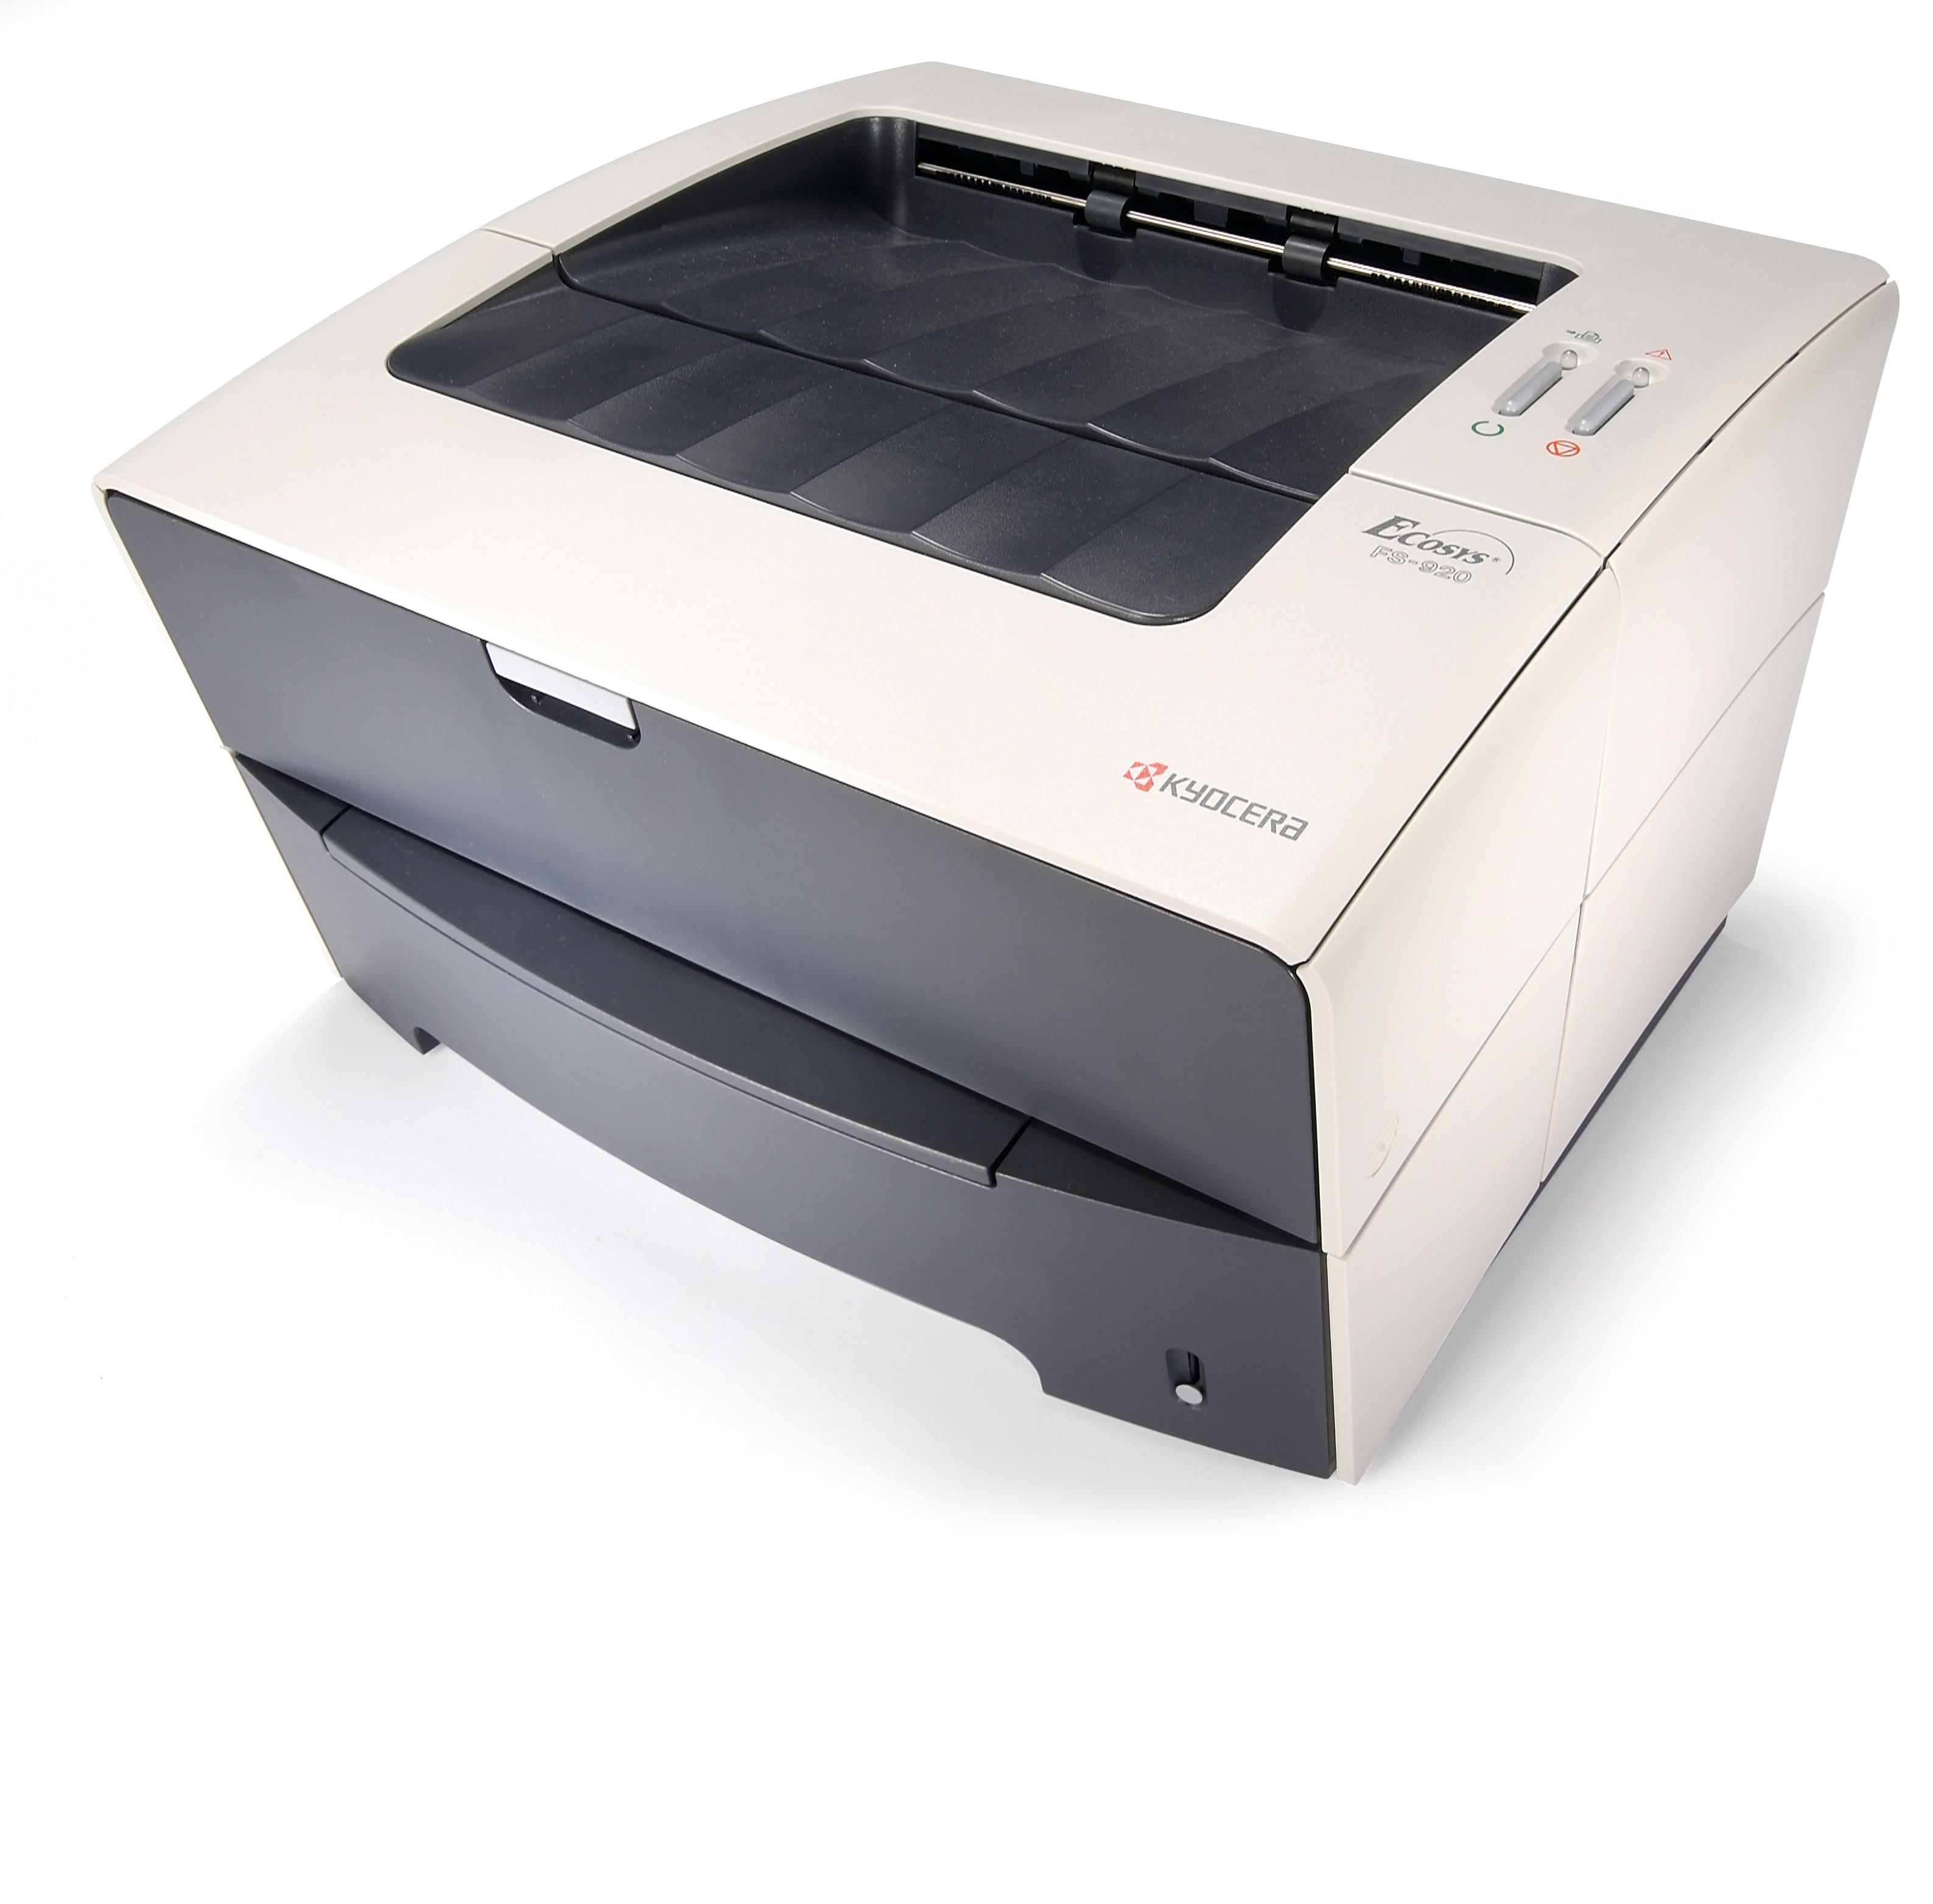 Printer list